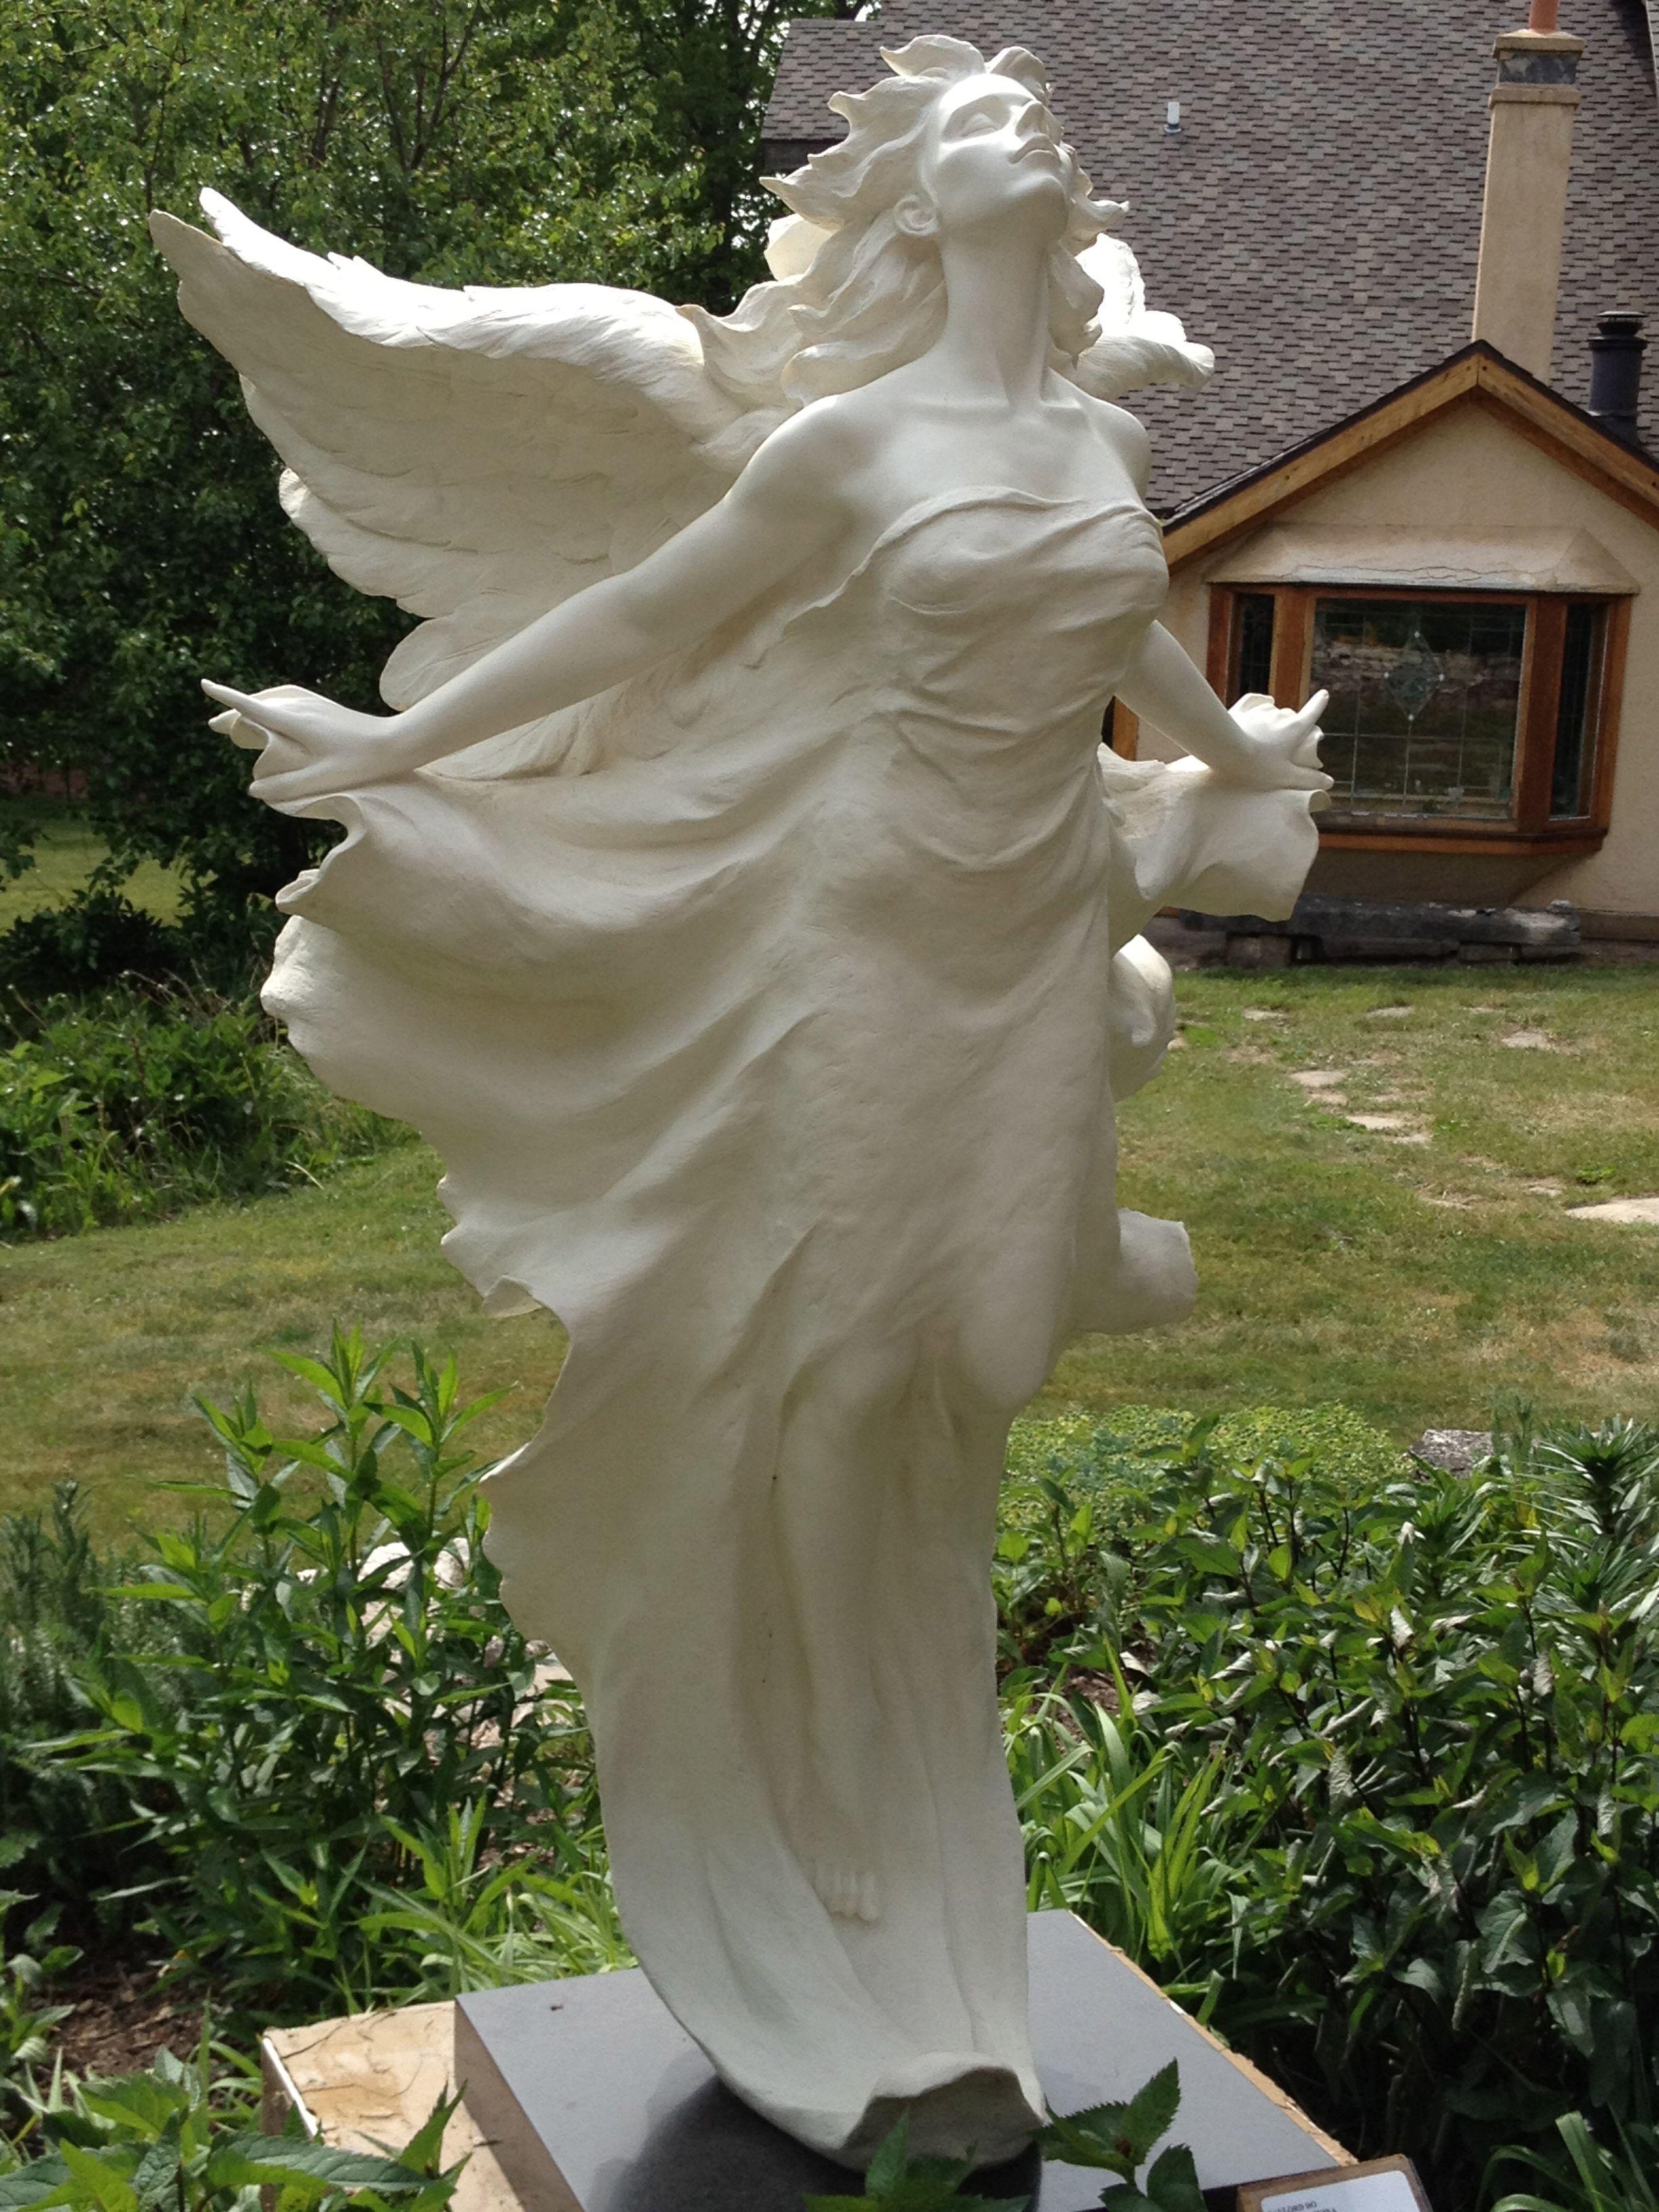 angel sculpture at the edgewood orchard garden in fish creek wi door county 2012 edgewood. Black Bedroom Furniture Sets. Home Design Ideas